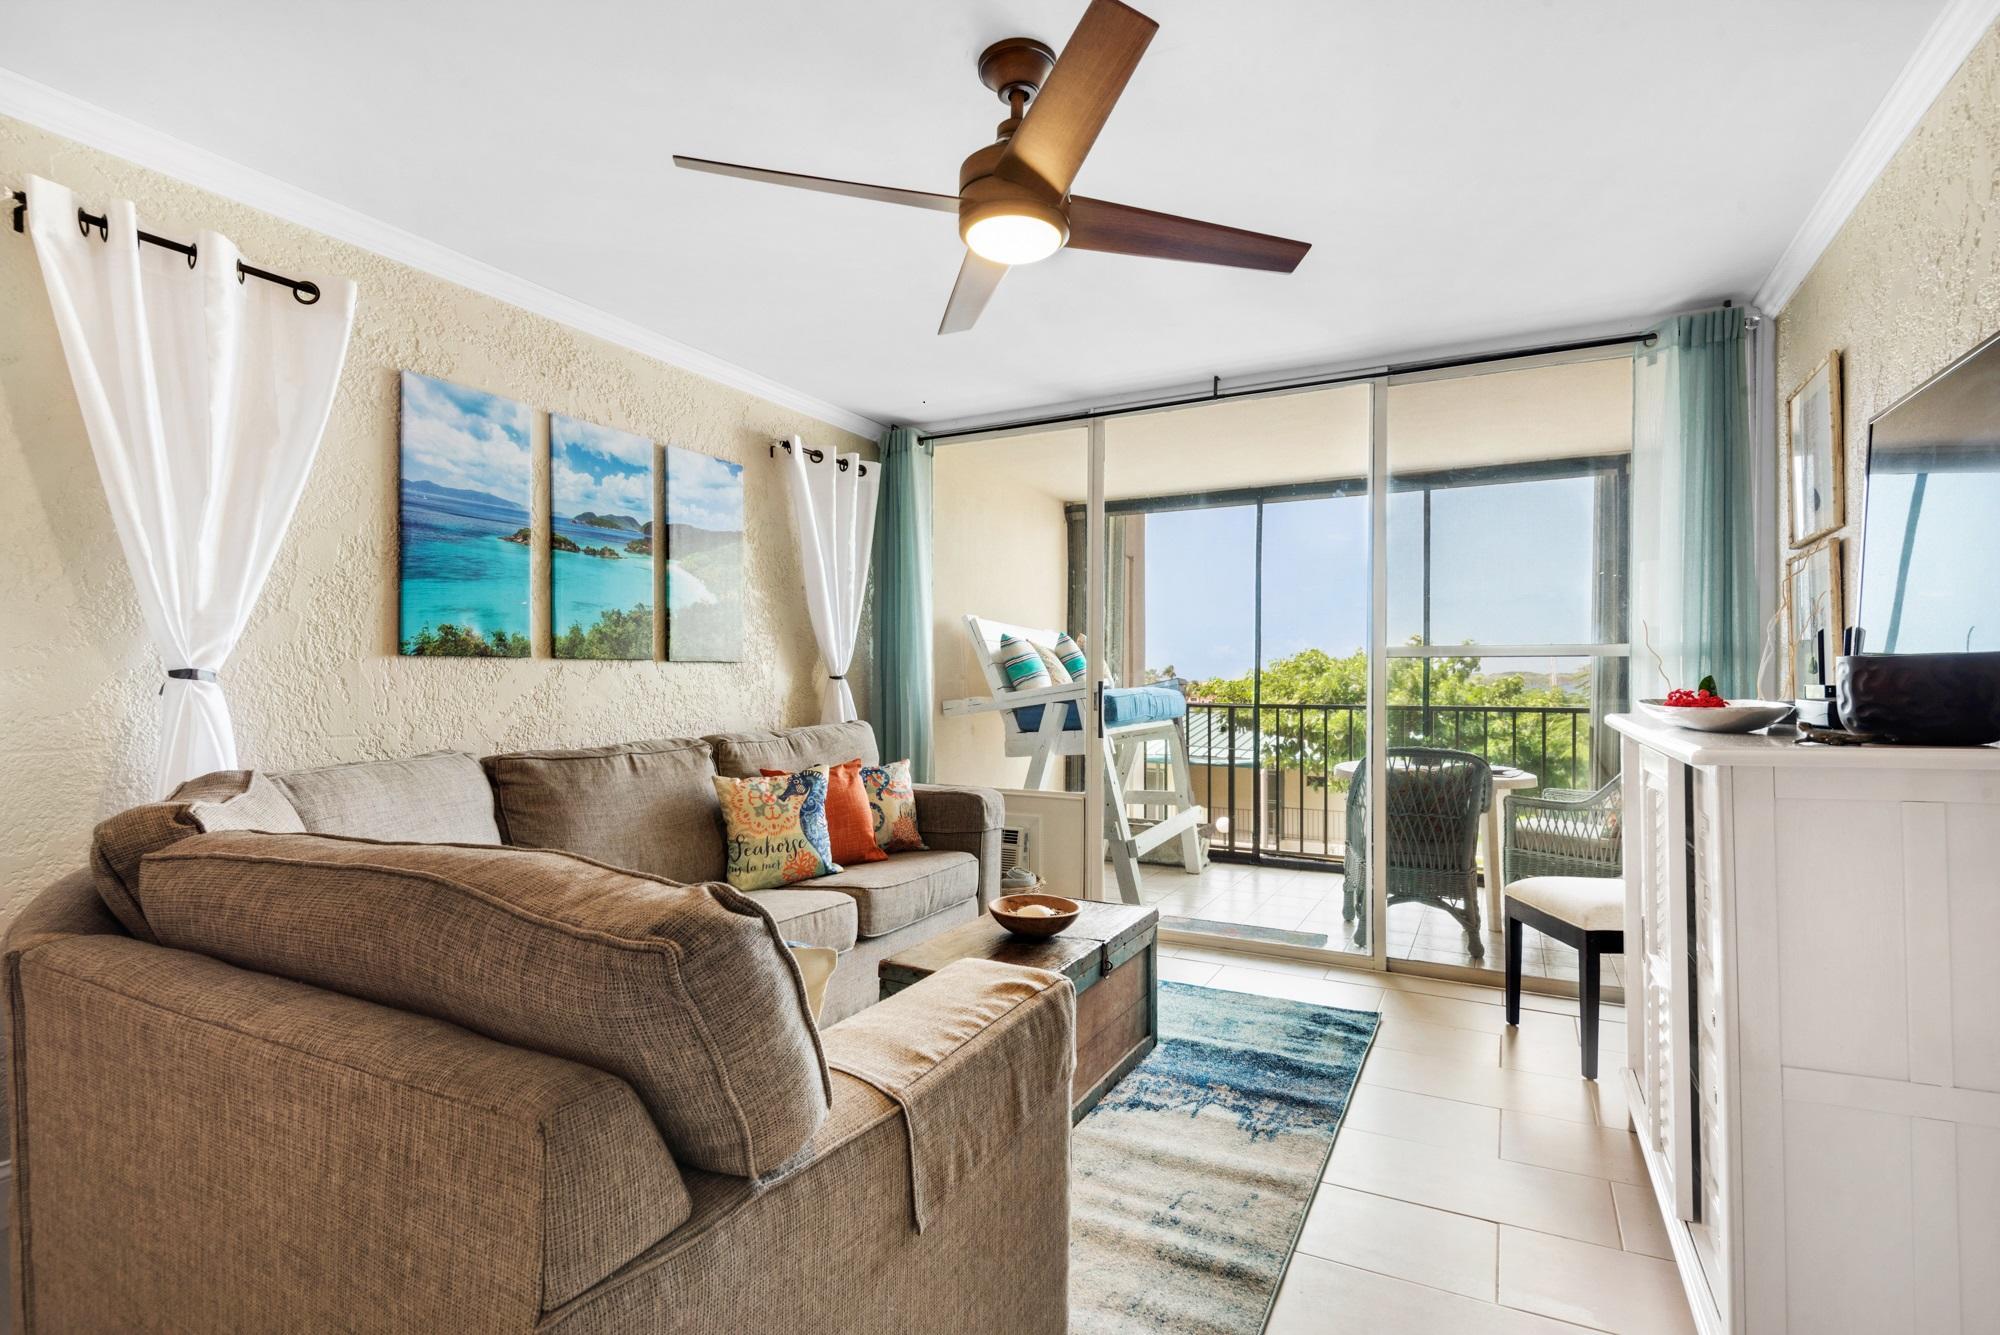 Condominium for Sale at Sapphire Hill Village 192 Smith Bay EE Sapphire Hill Village 192 Smith Bay EE St Thomas, Virgin Islands 00802 United States Virgin Islands